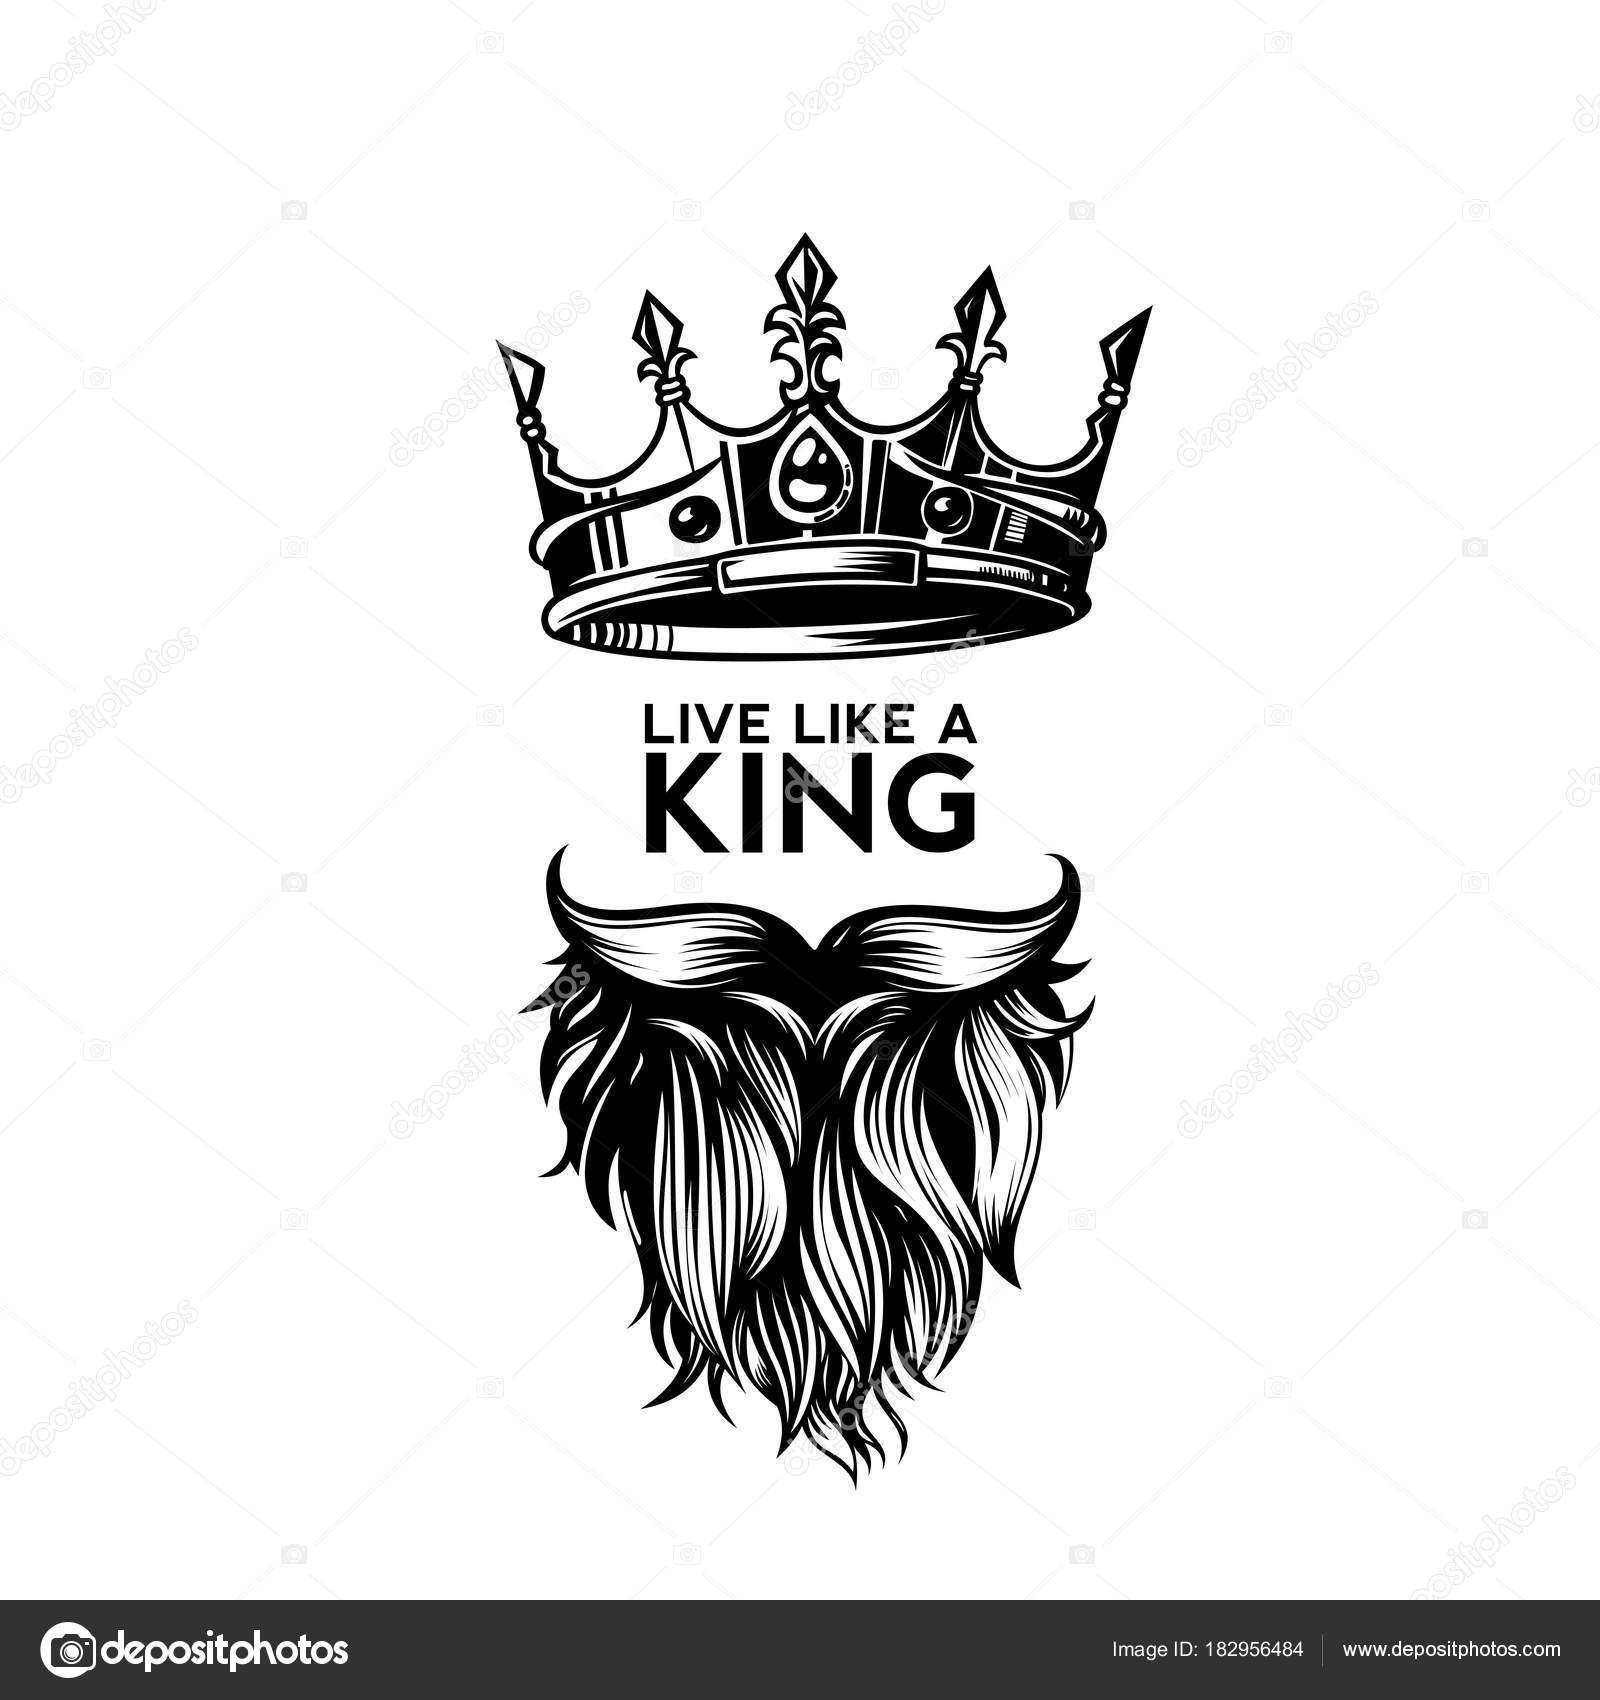 Hipster Design Studio Logo Vector: King Crown, Moustache And Beard Logo Vector Illustration